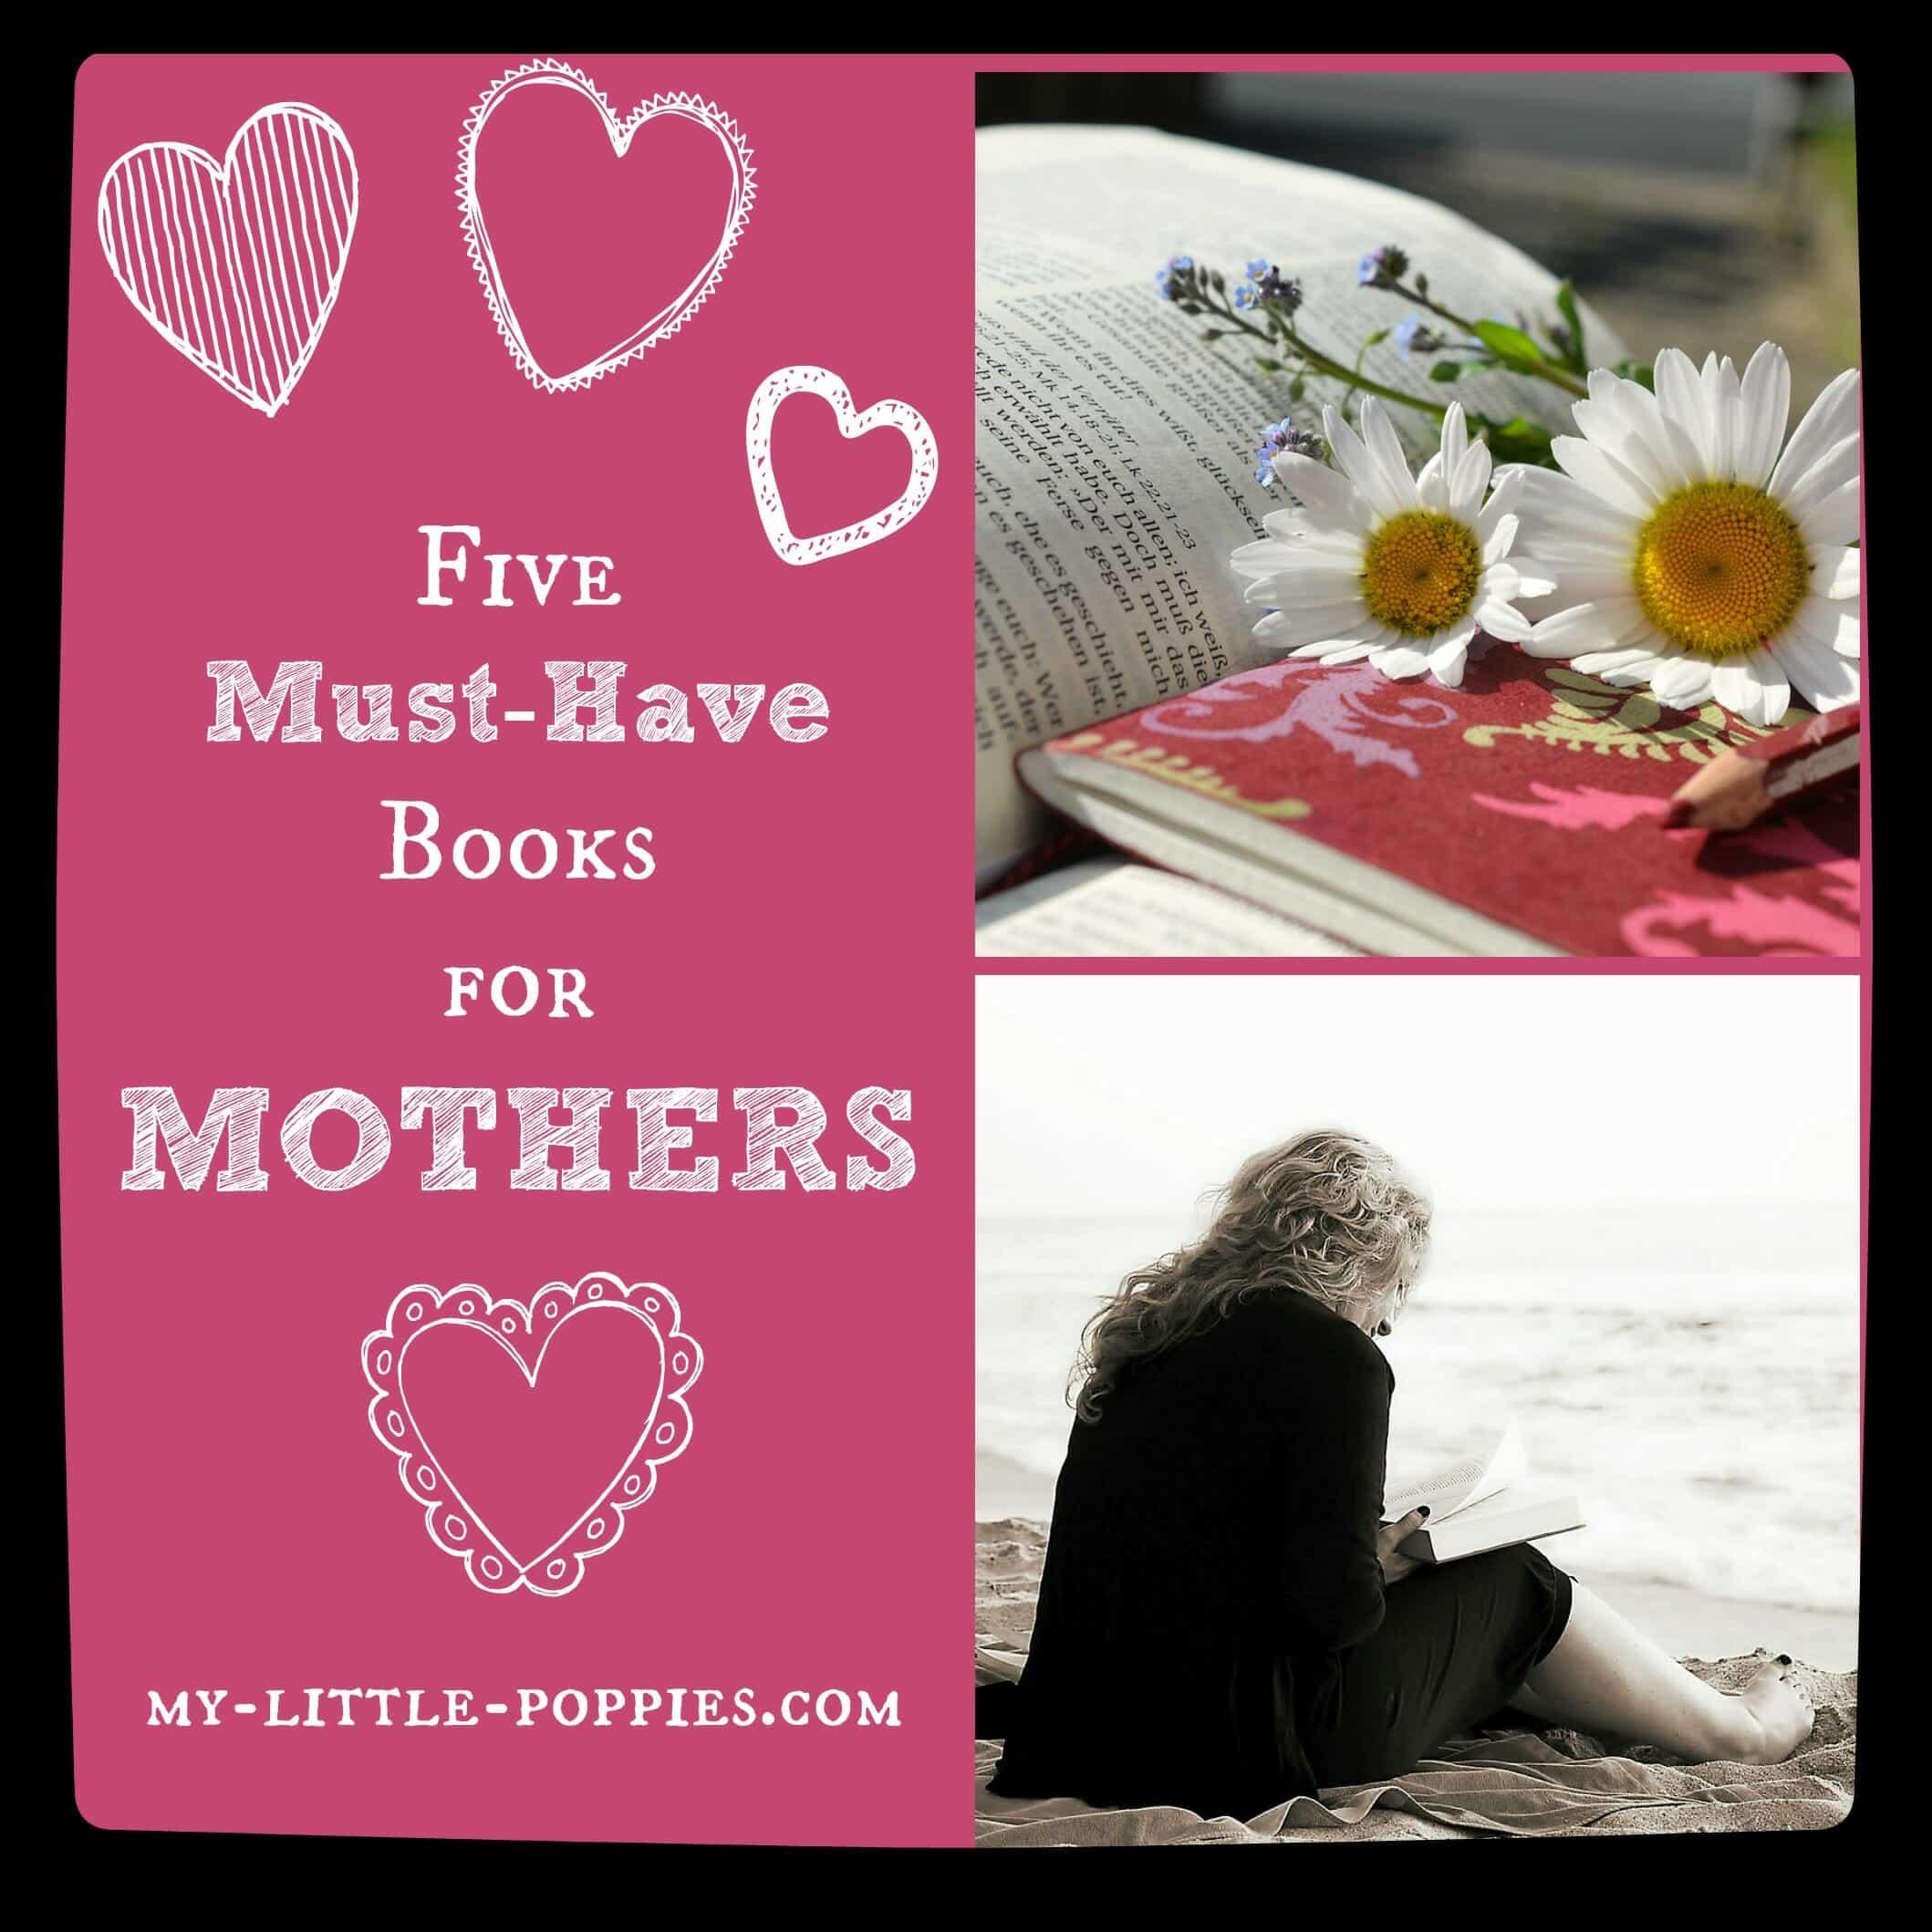 5 Must-Have Books on Motherhood